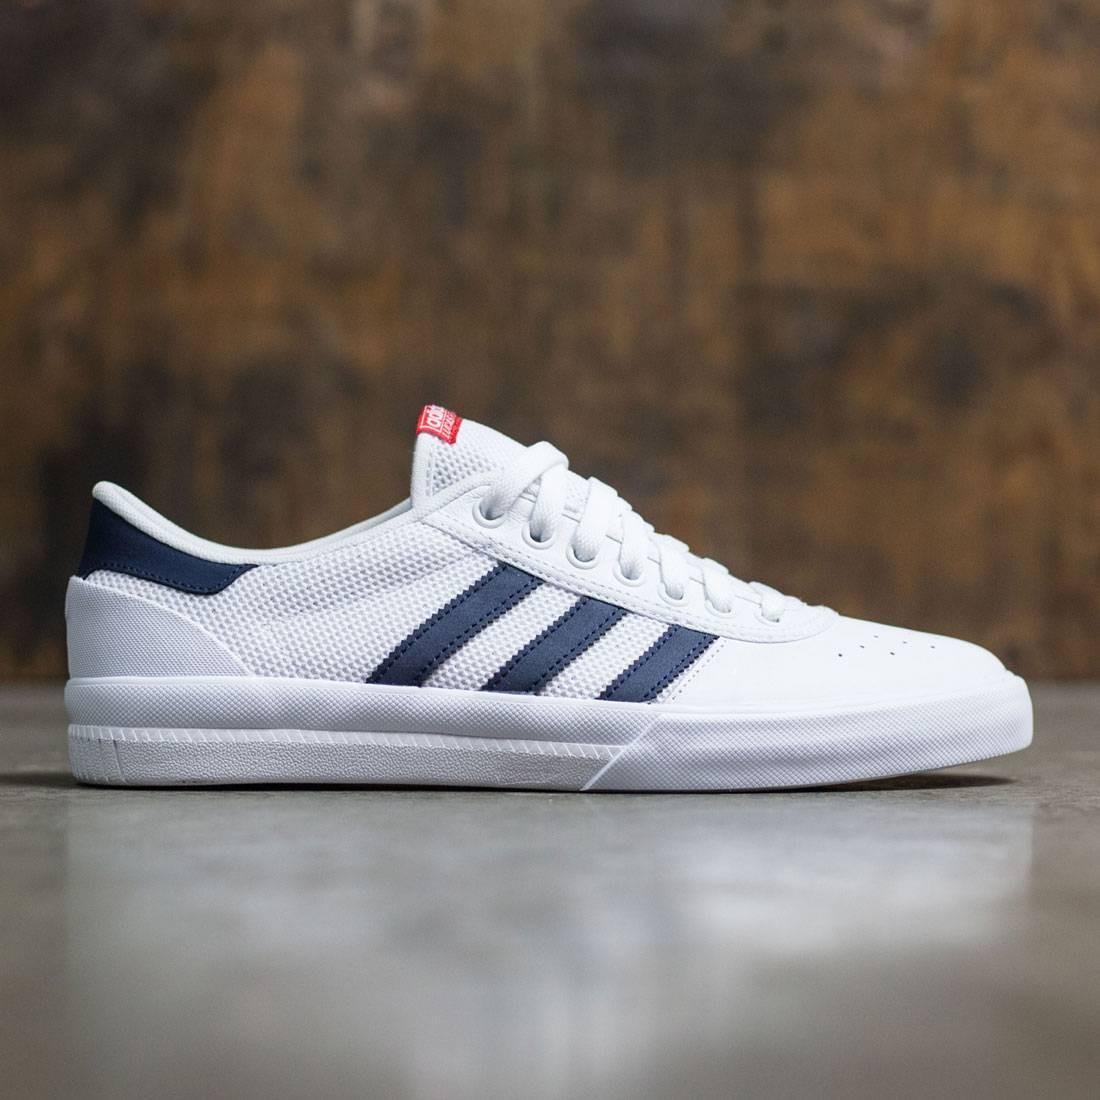 Adidas Lucas Premiere Adv Shoes White Collegiate Navy Scarlet